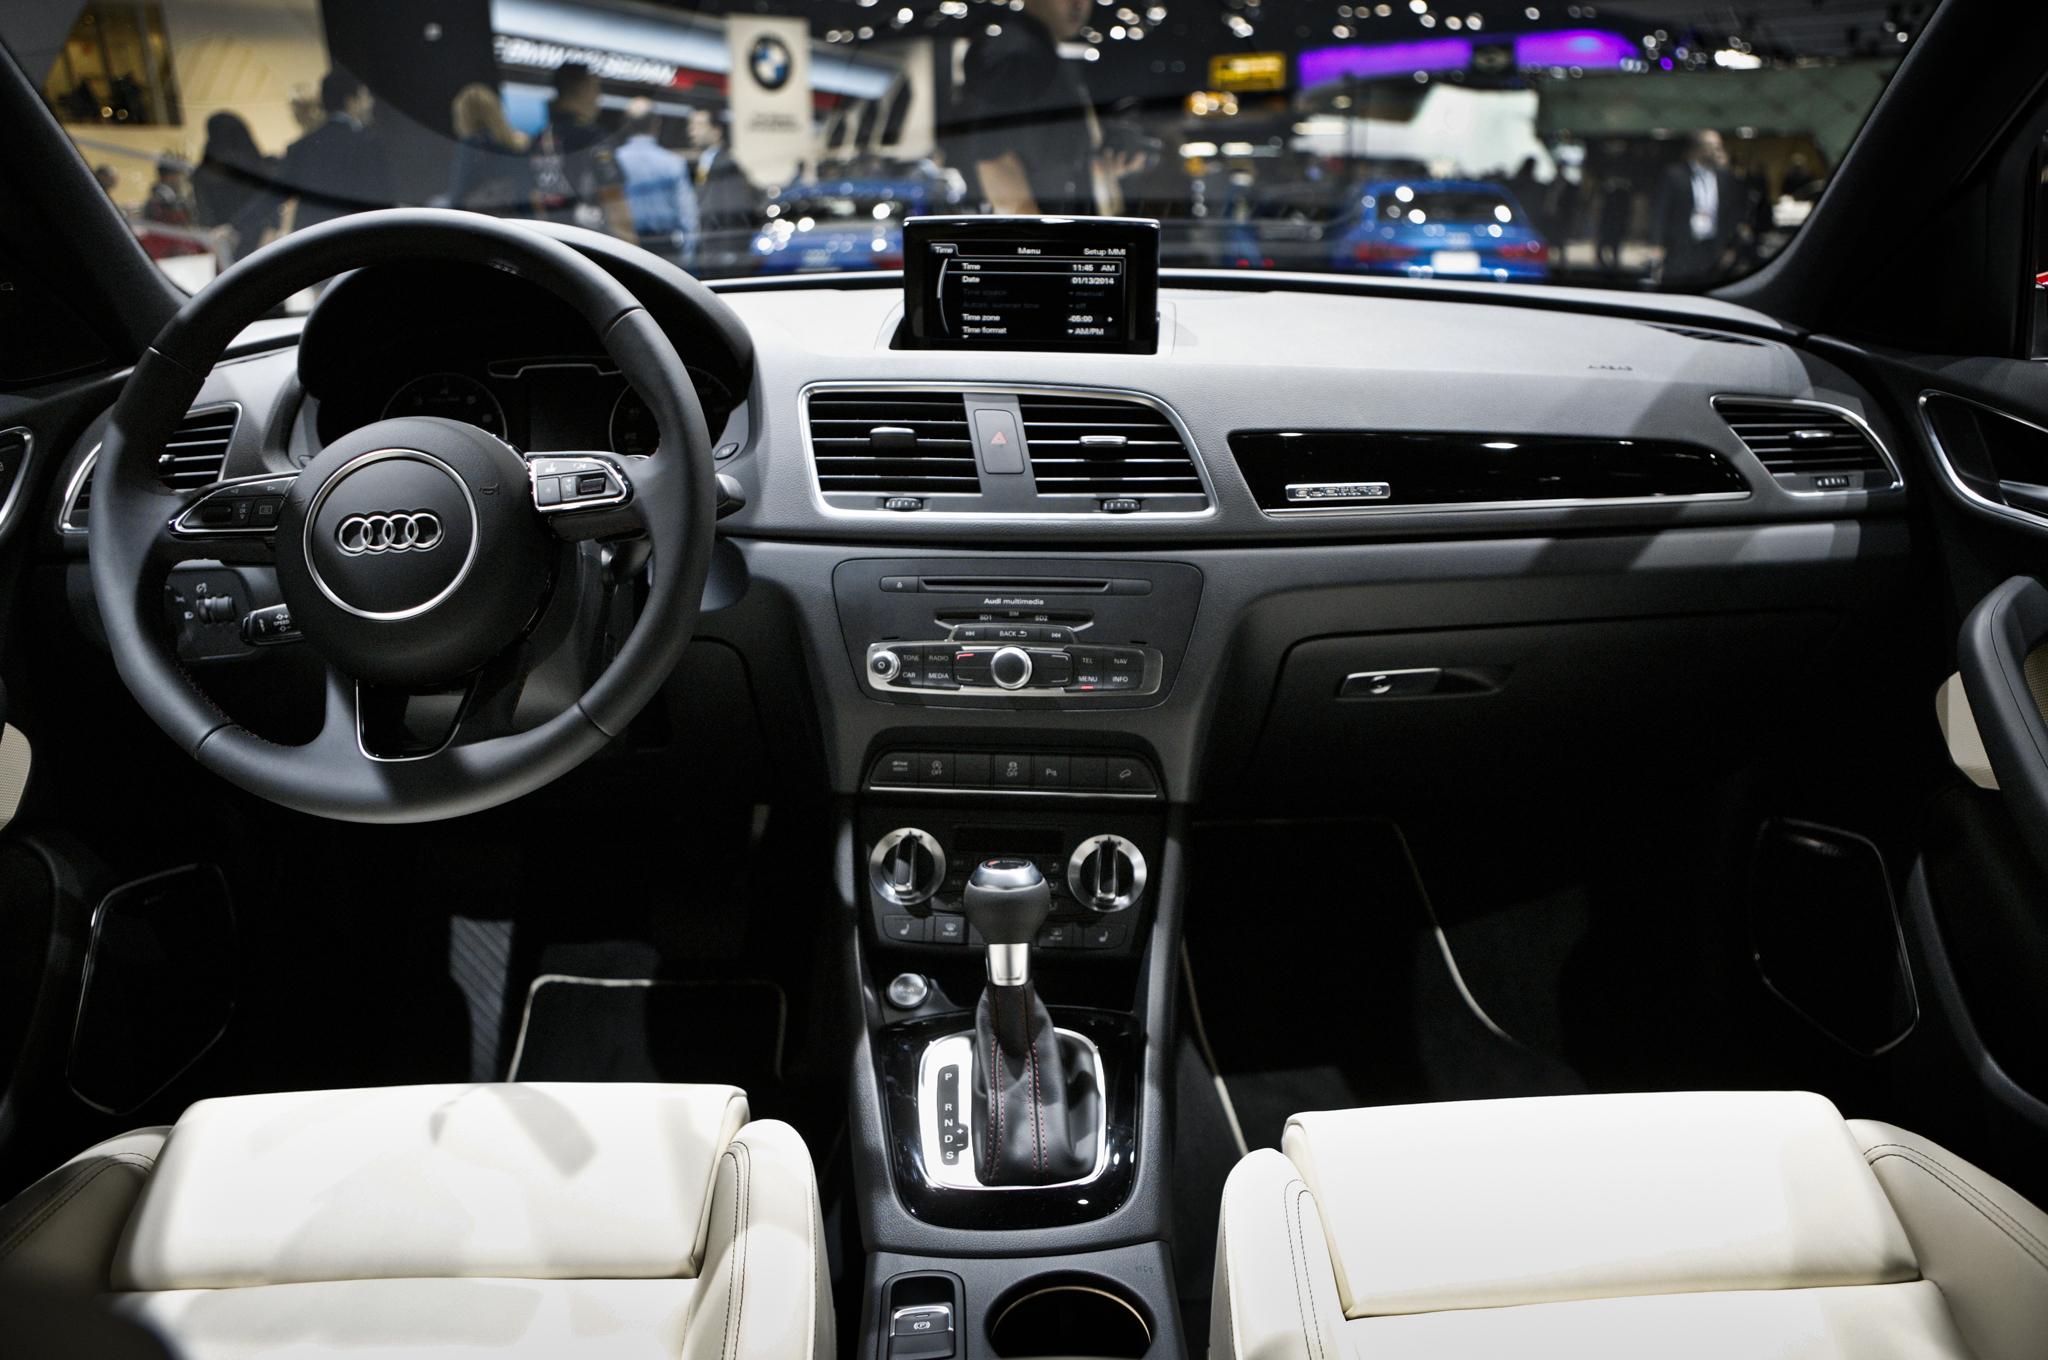 2015 Audi Q3 Dashboard Interior View